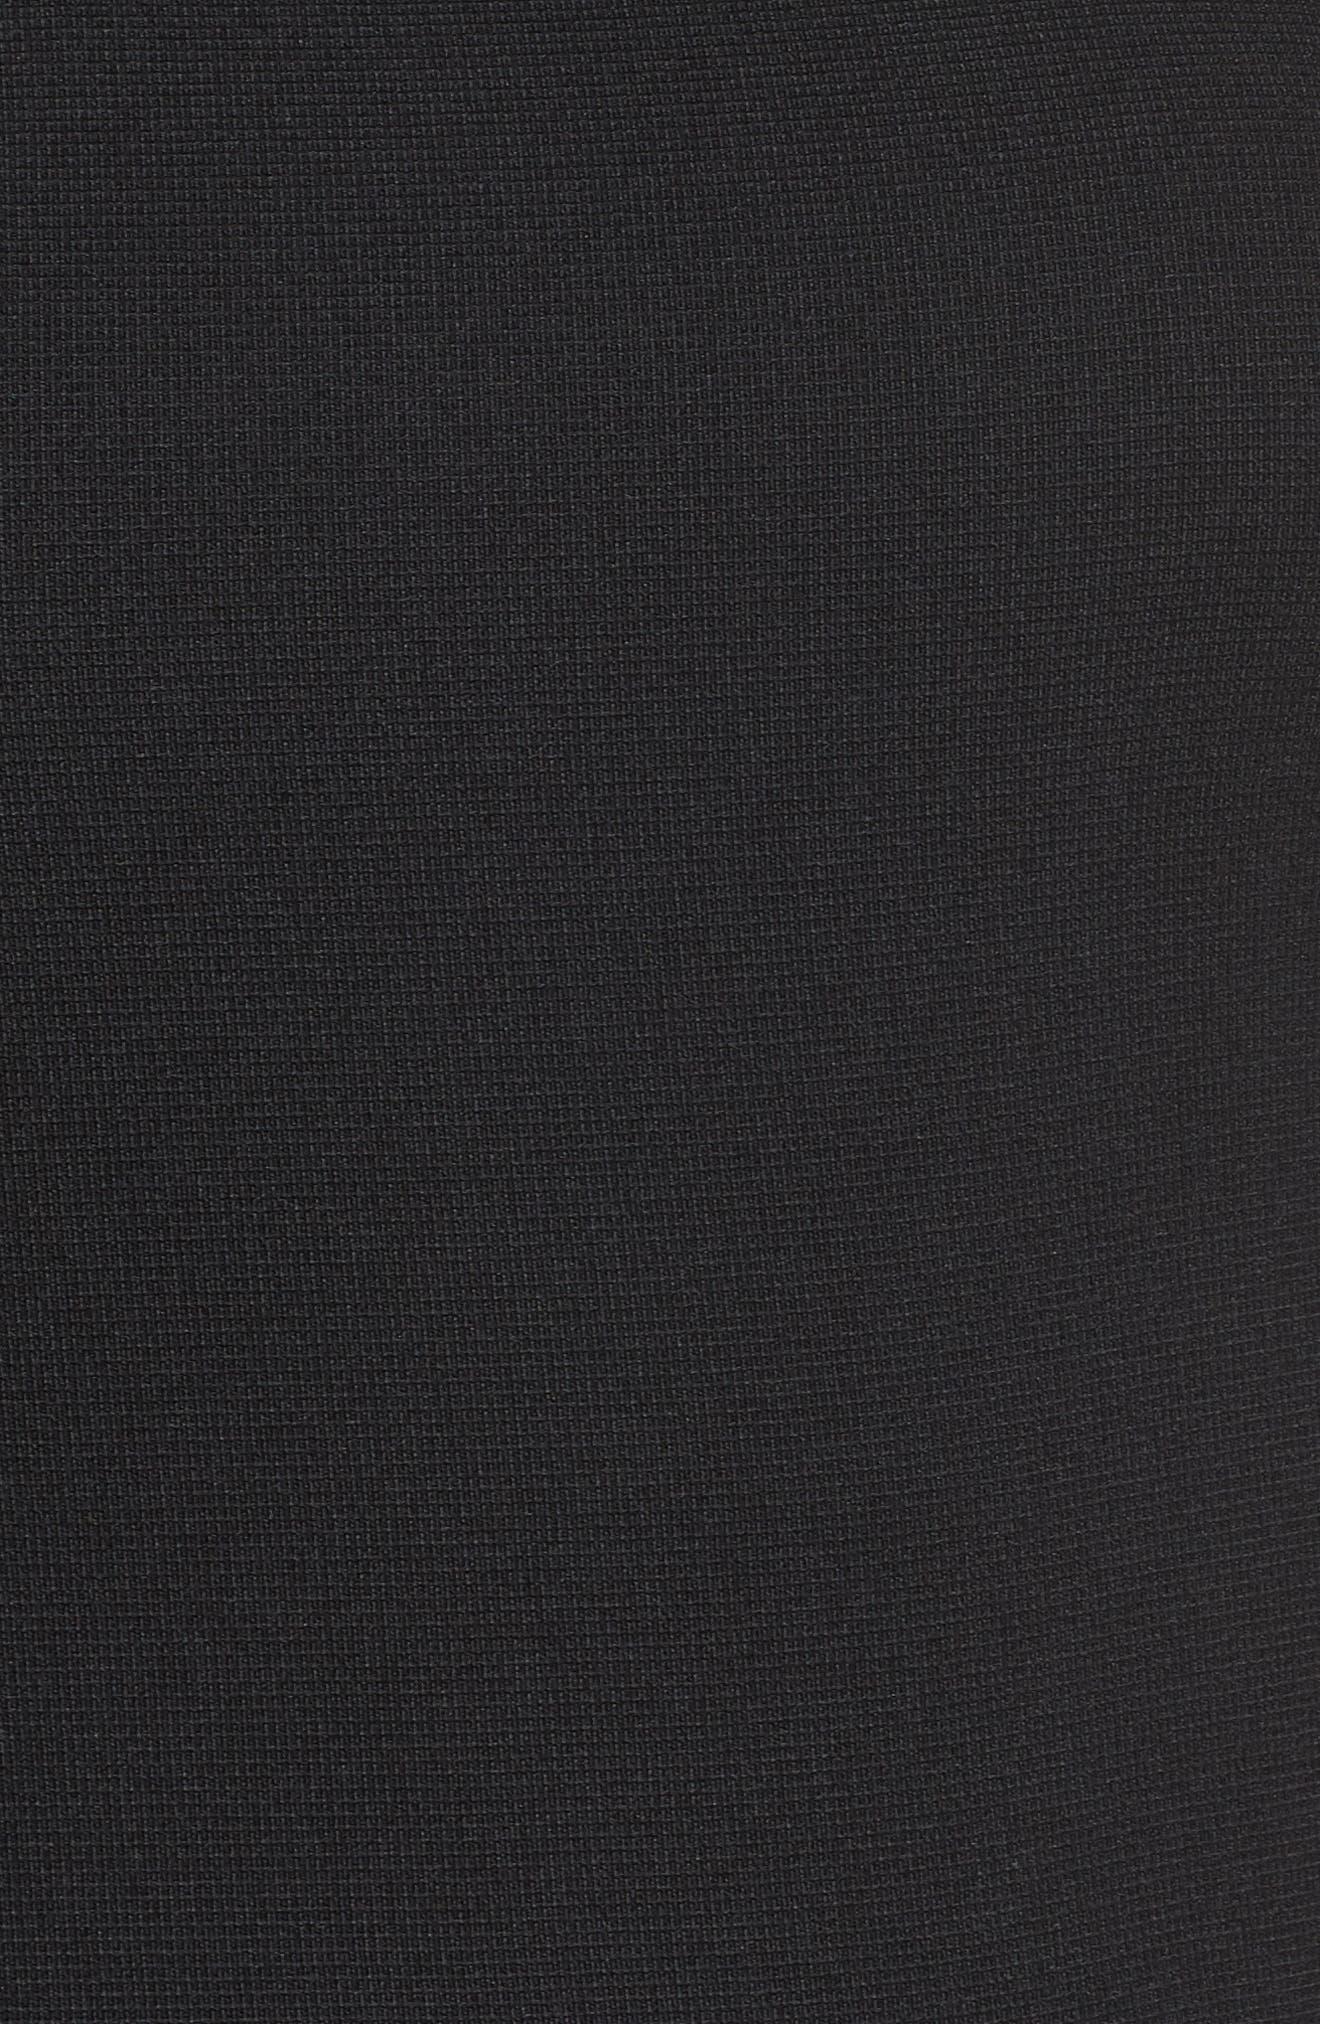 Ruffle Tiered Shift Dress,                             Alternate thumbnail 6, color,                             BLACK